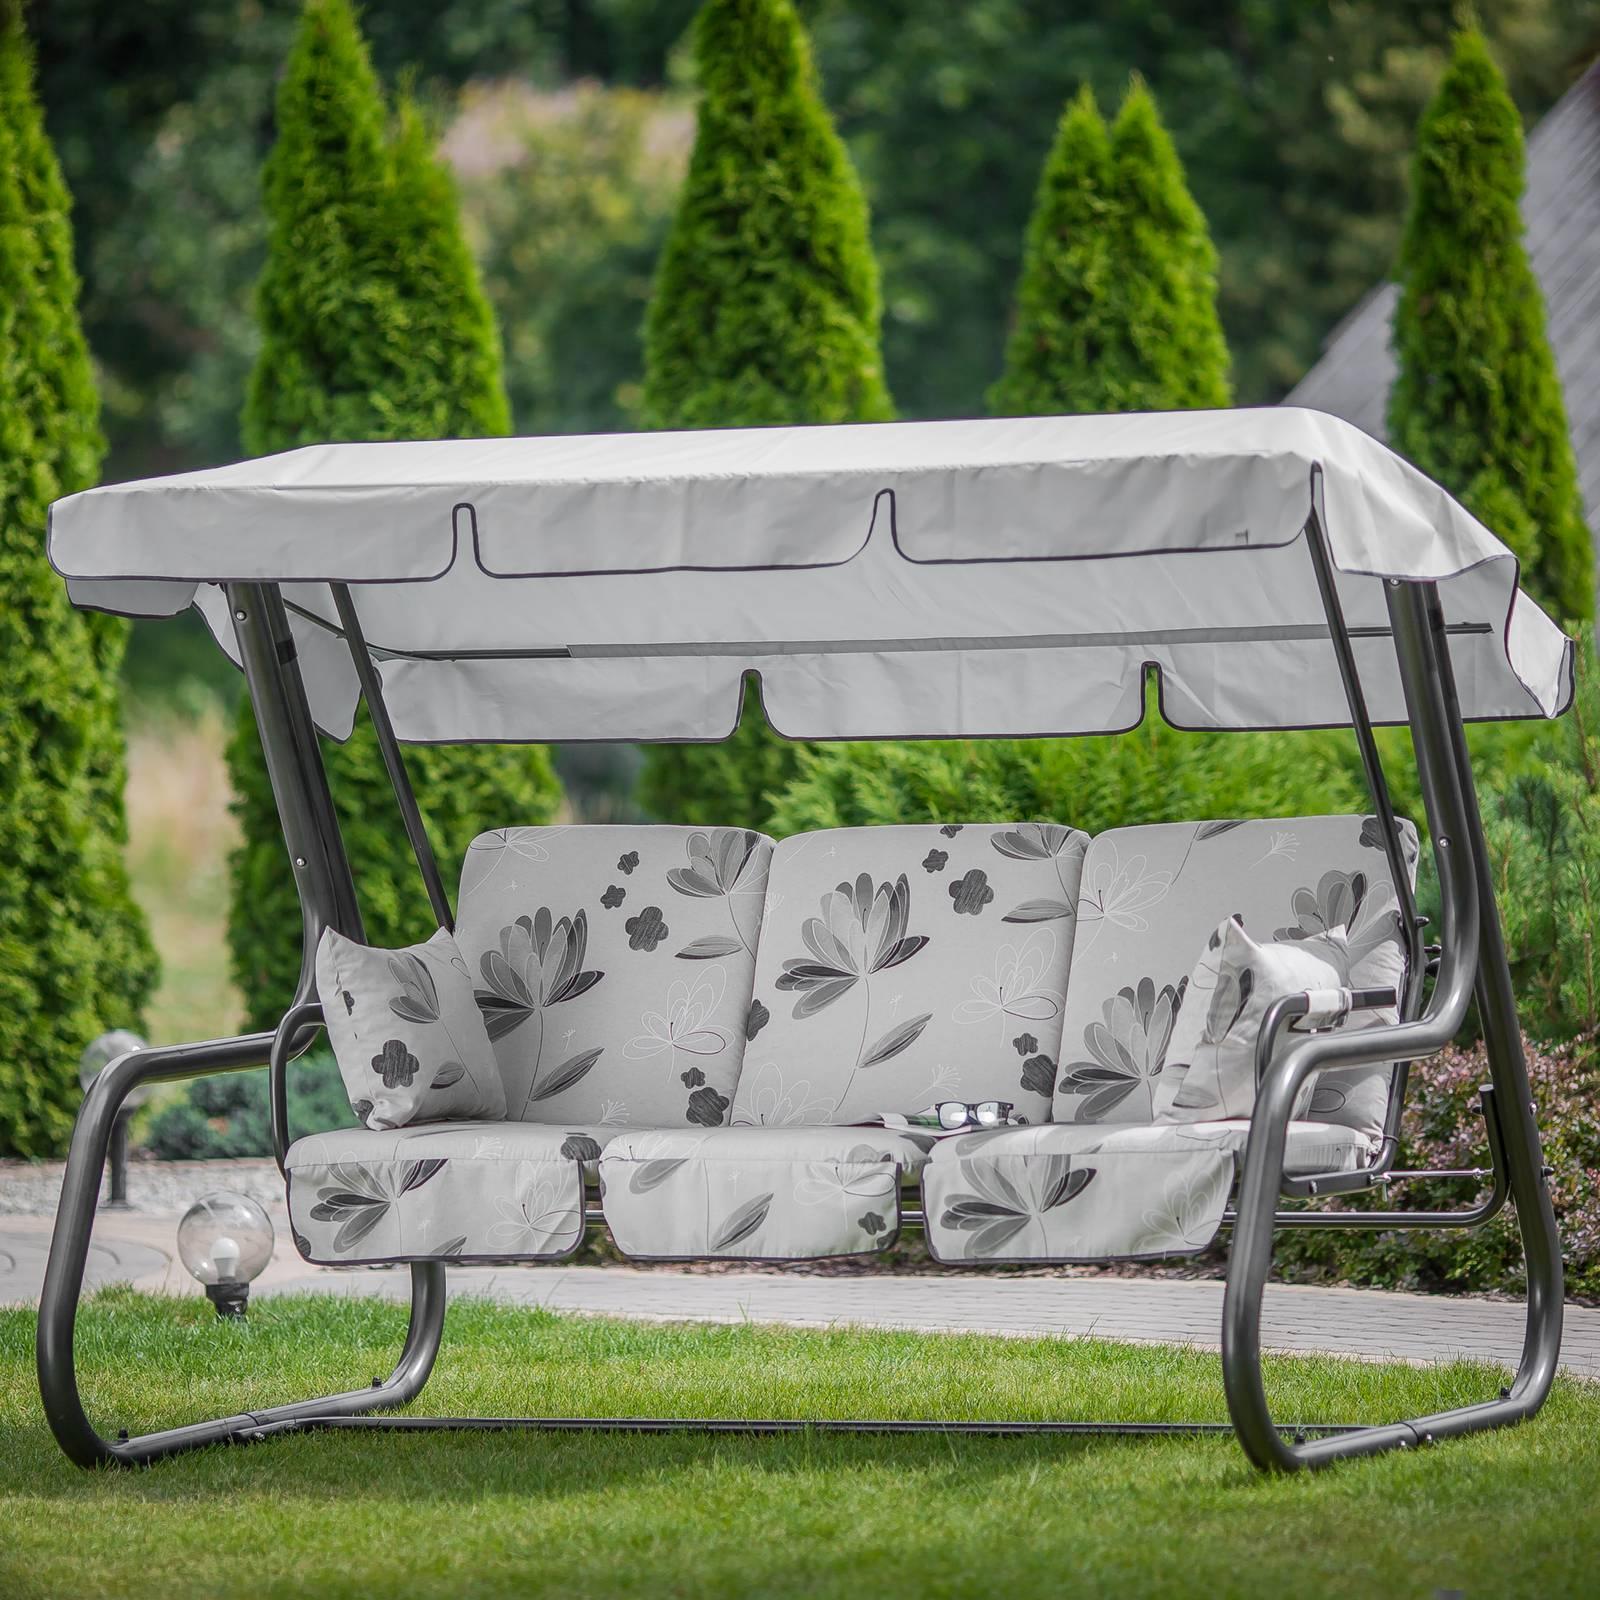 Replacement garden swing cushions 180 cm Rimini / Venezia A035-04LB PATIO